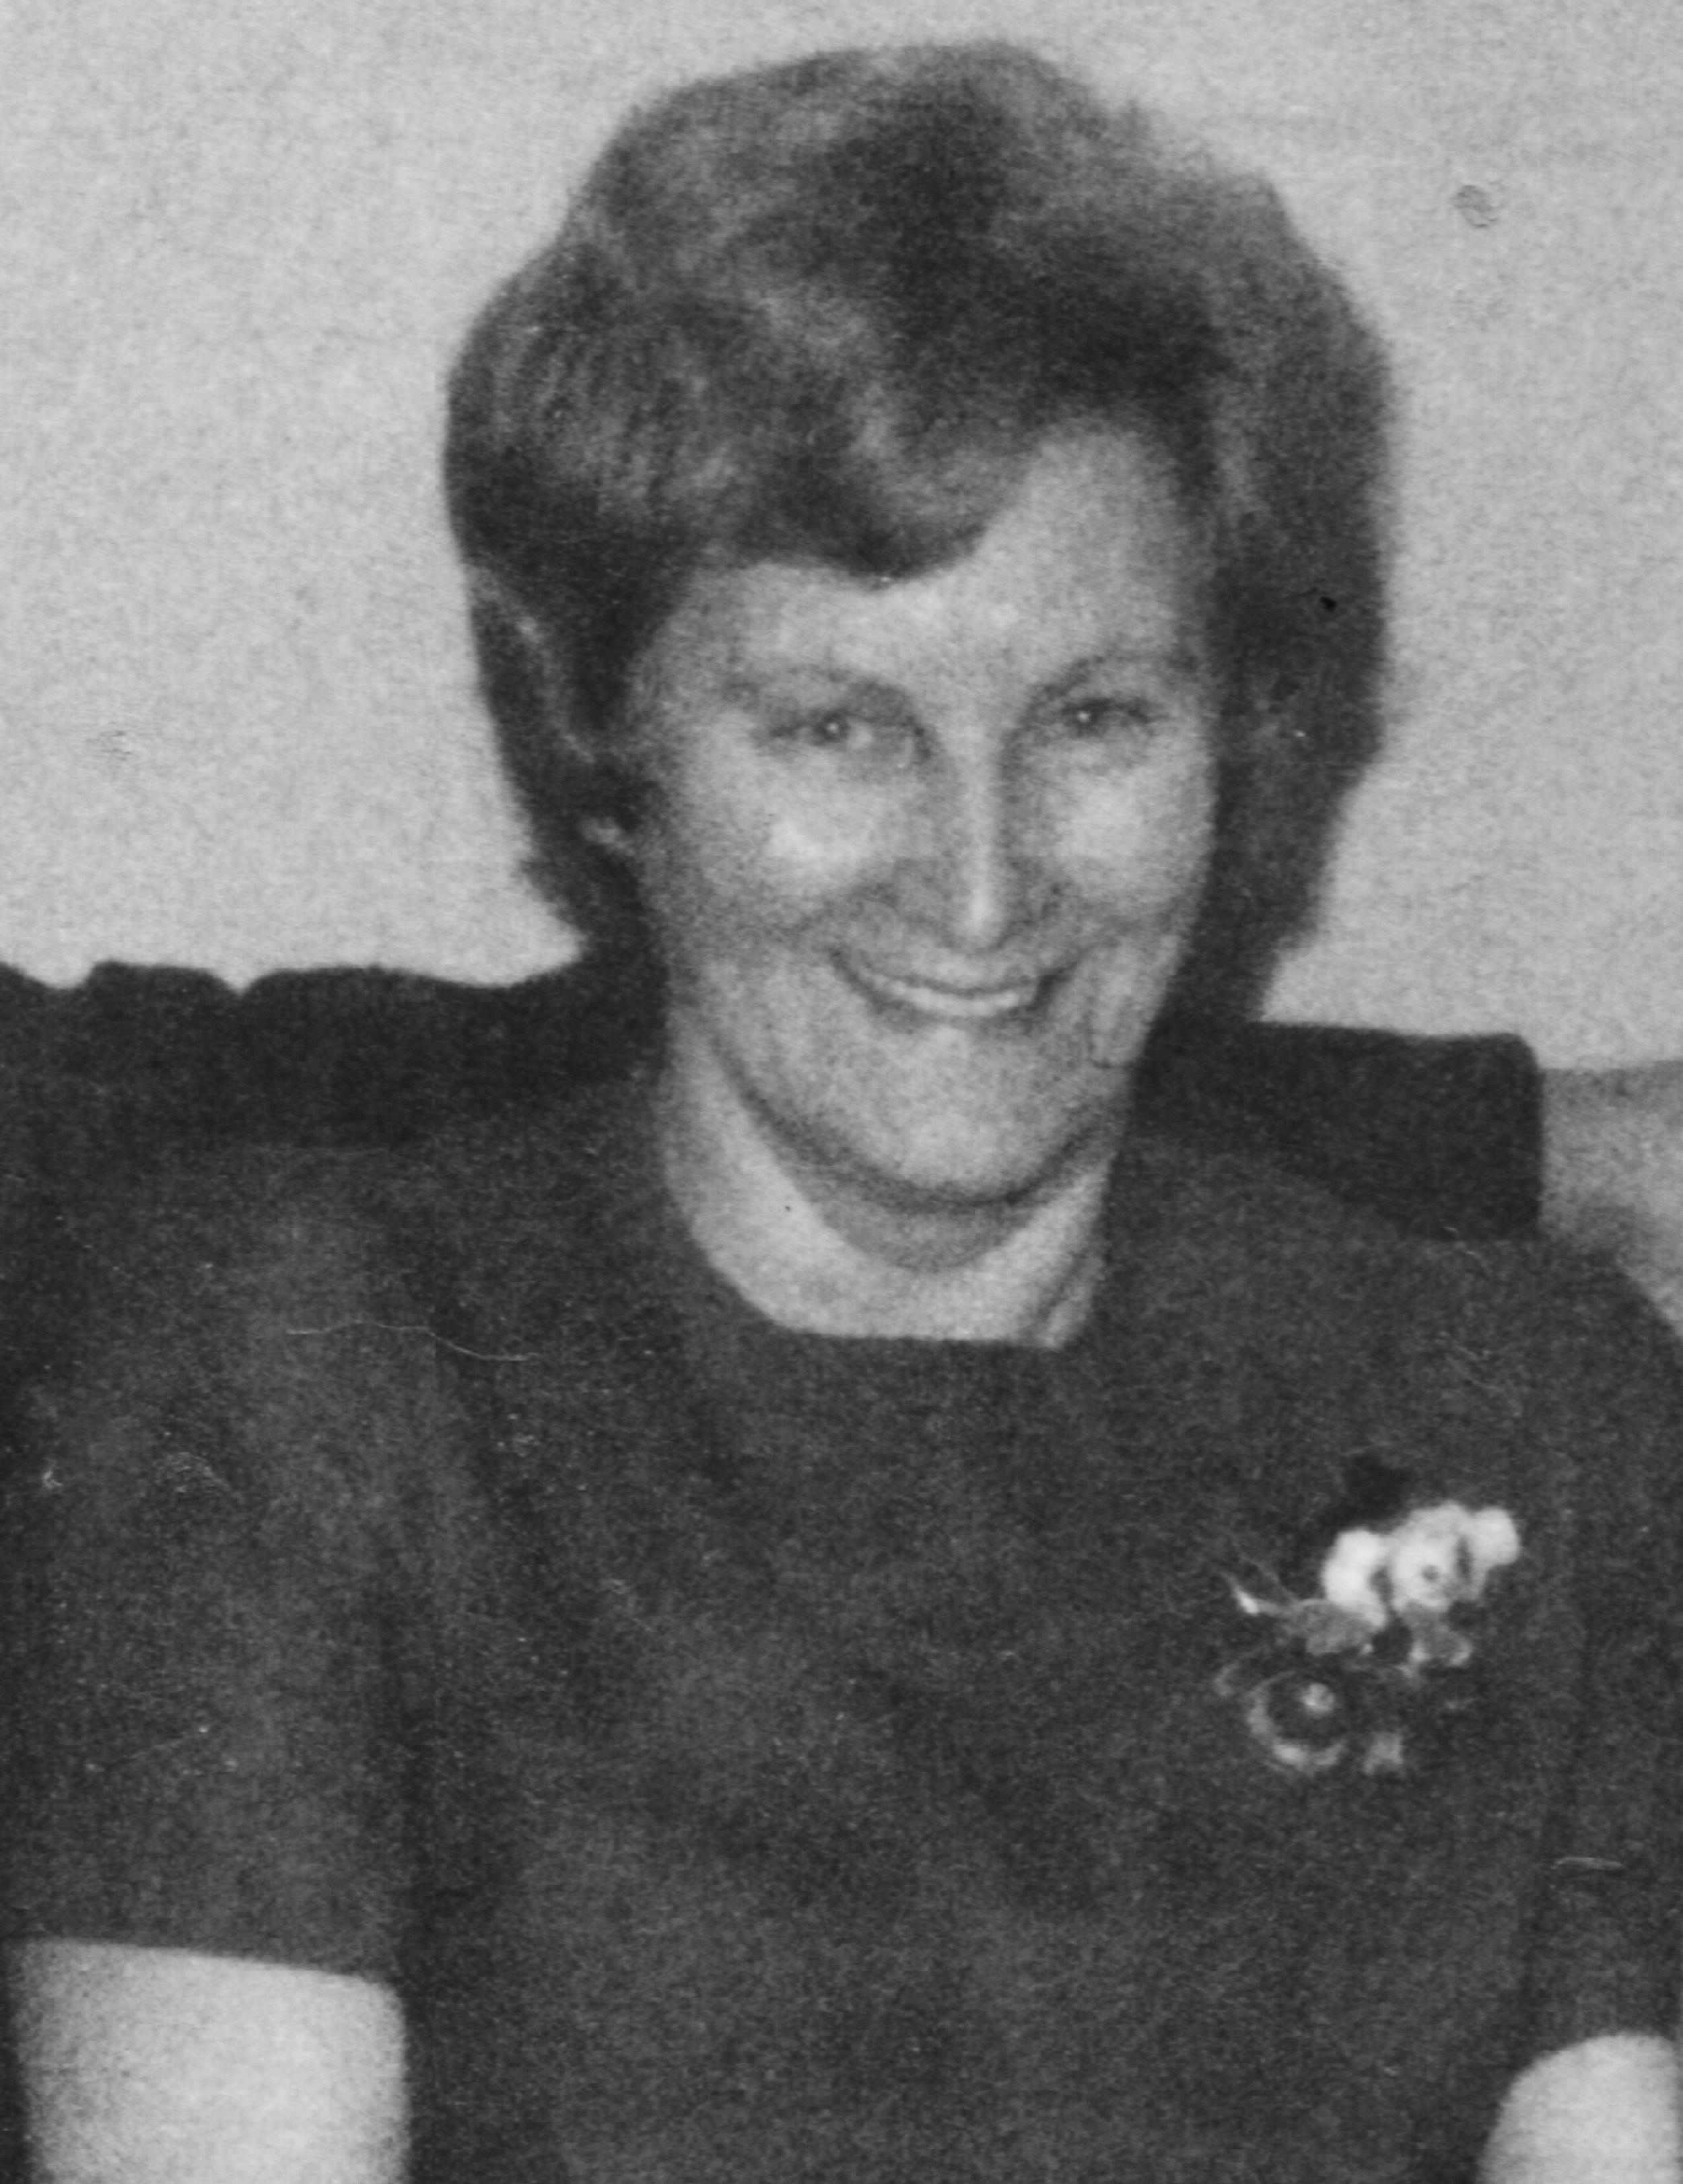 Gladys L. Cull - Bulletin Copy bbbb.jpg